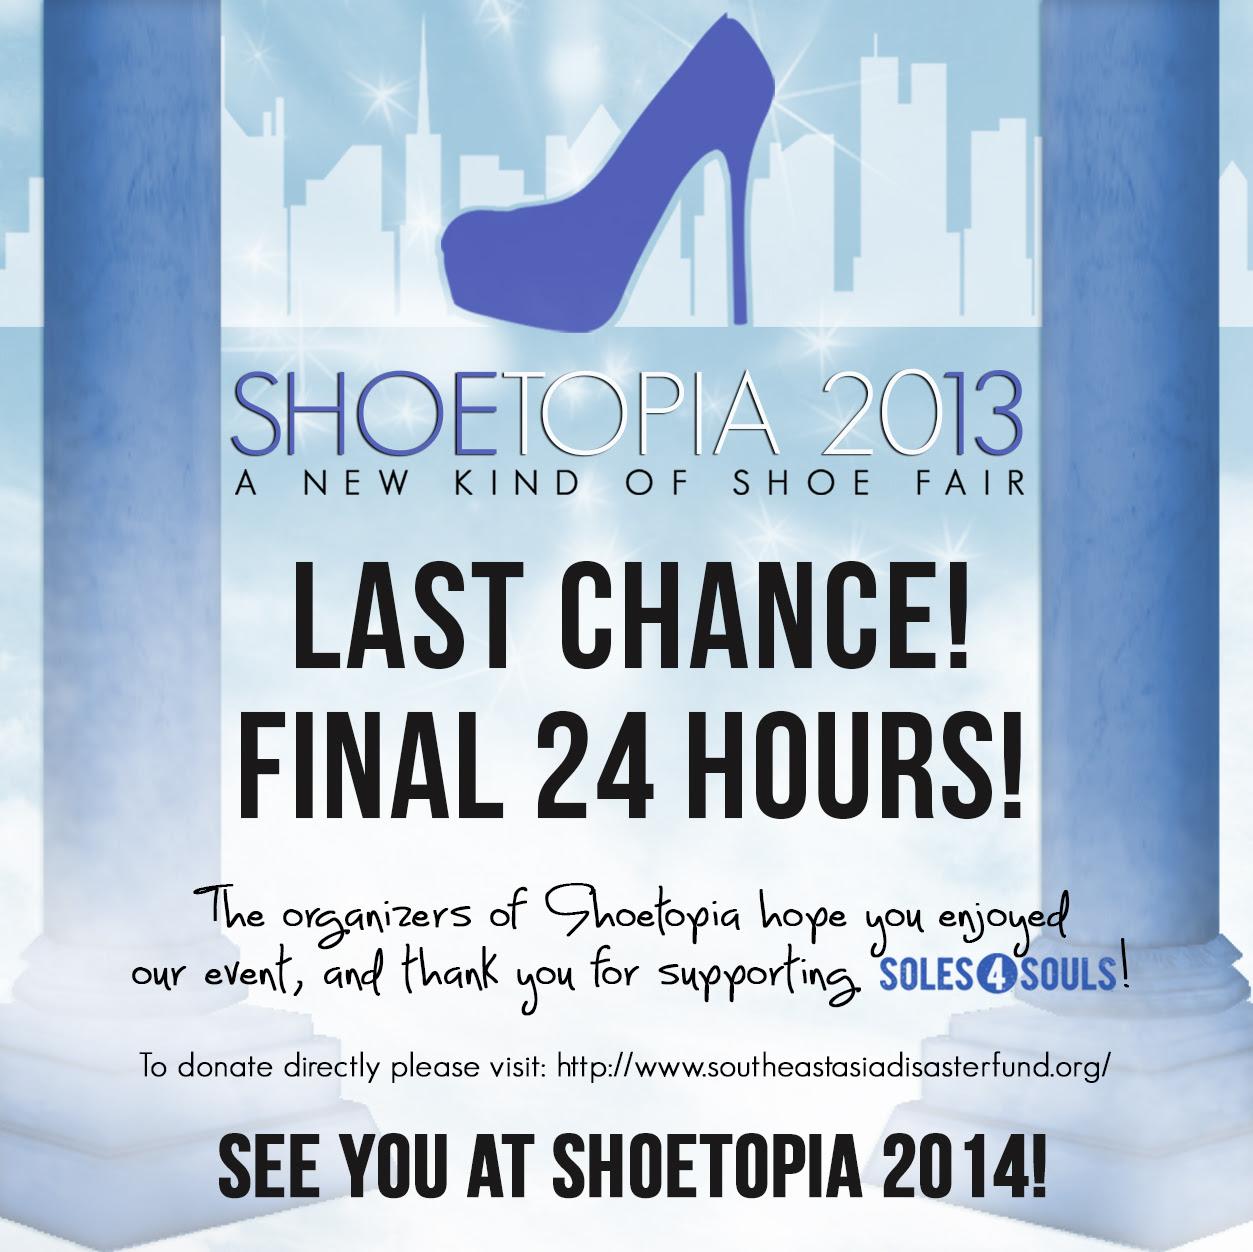 Last Chance to Visit SHOETOPIA 2013!